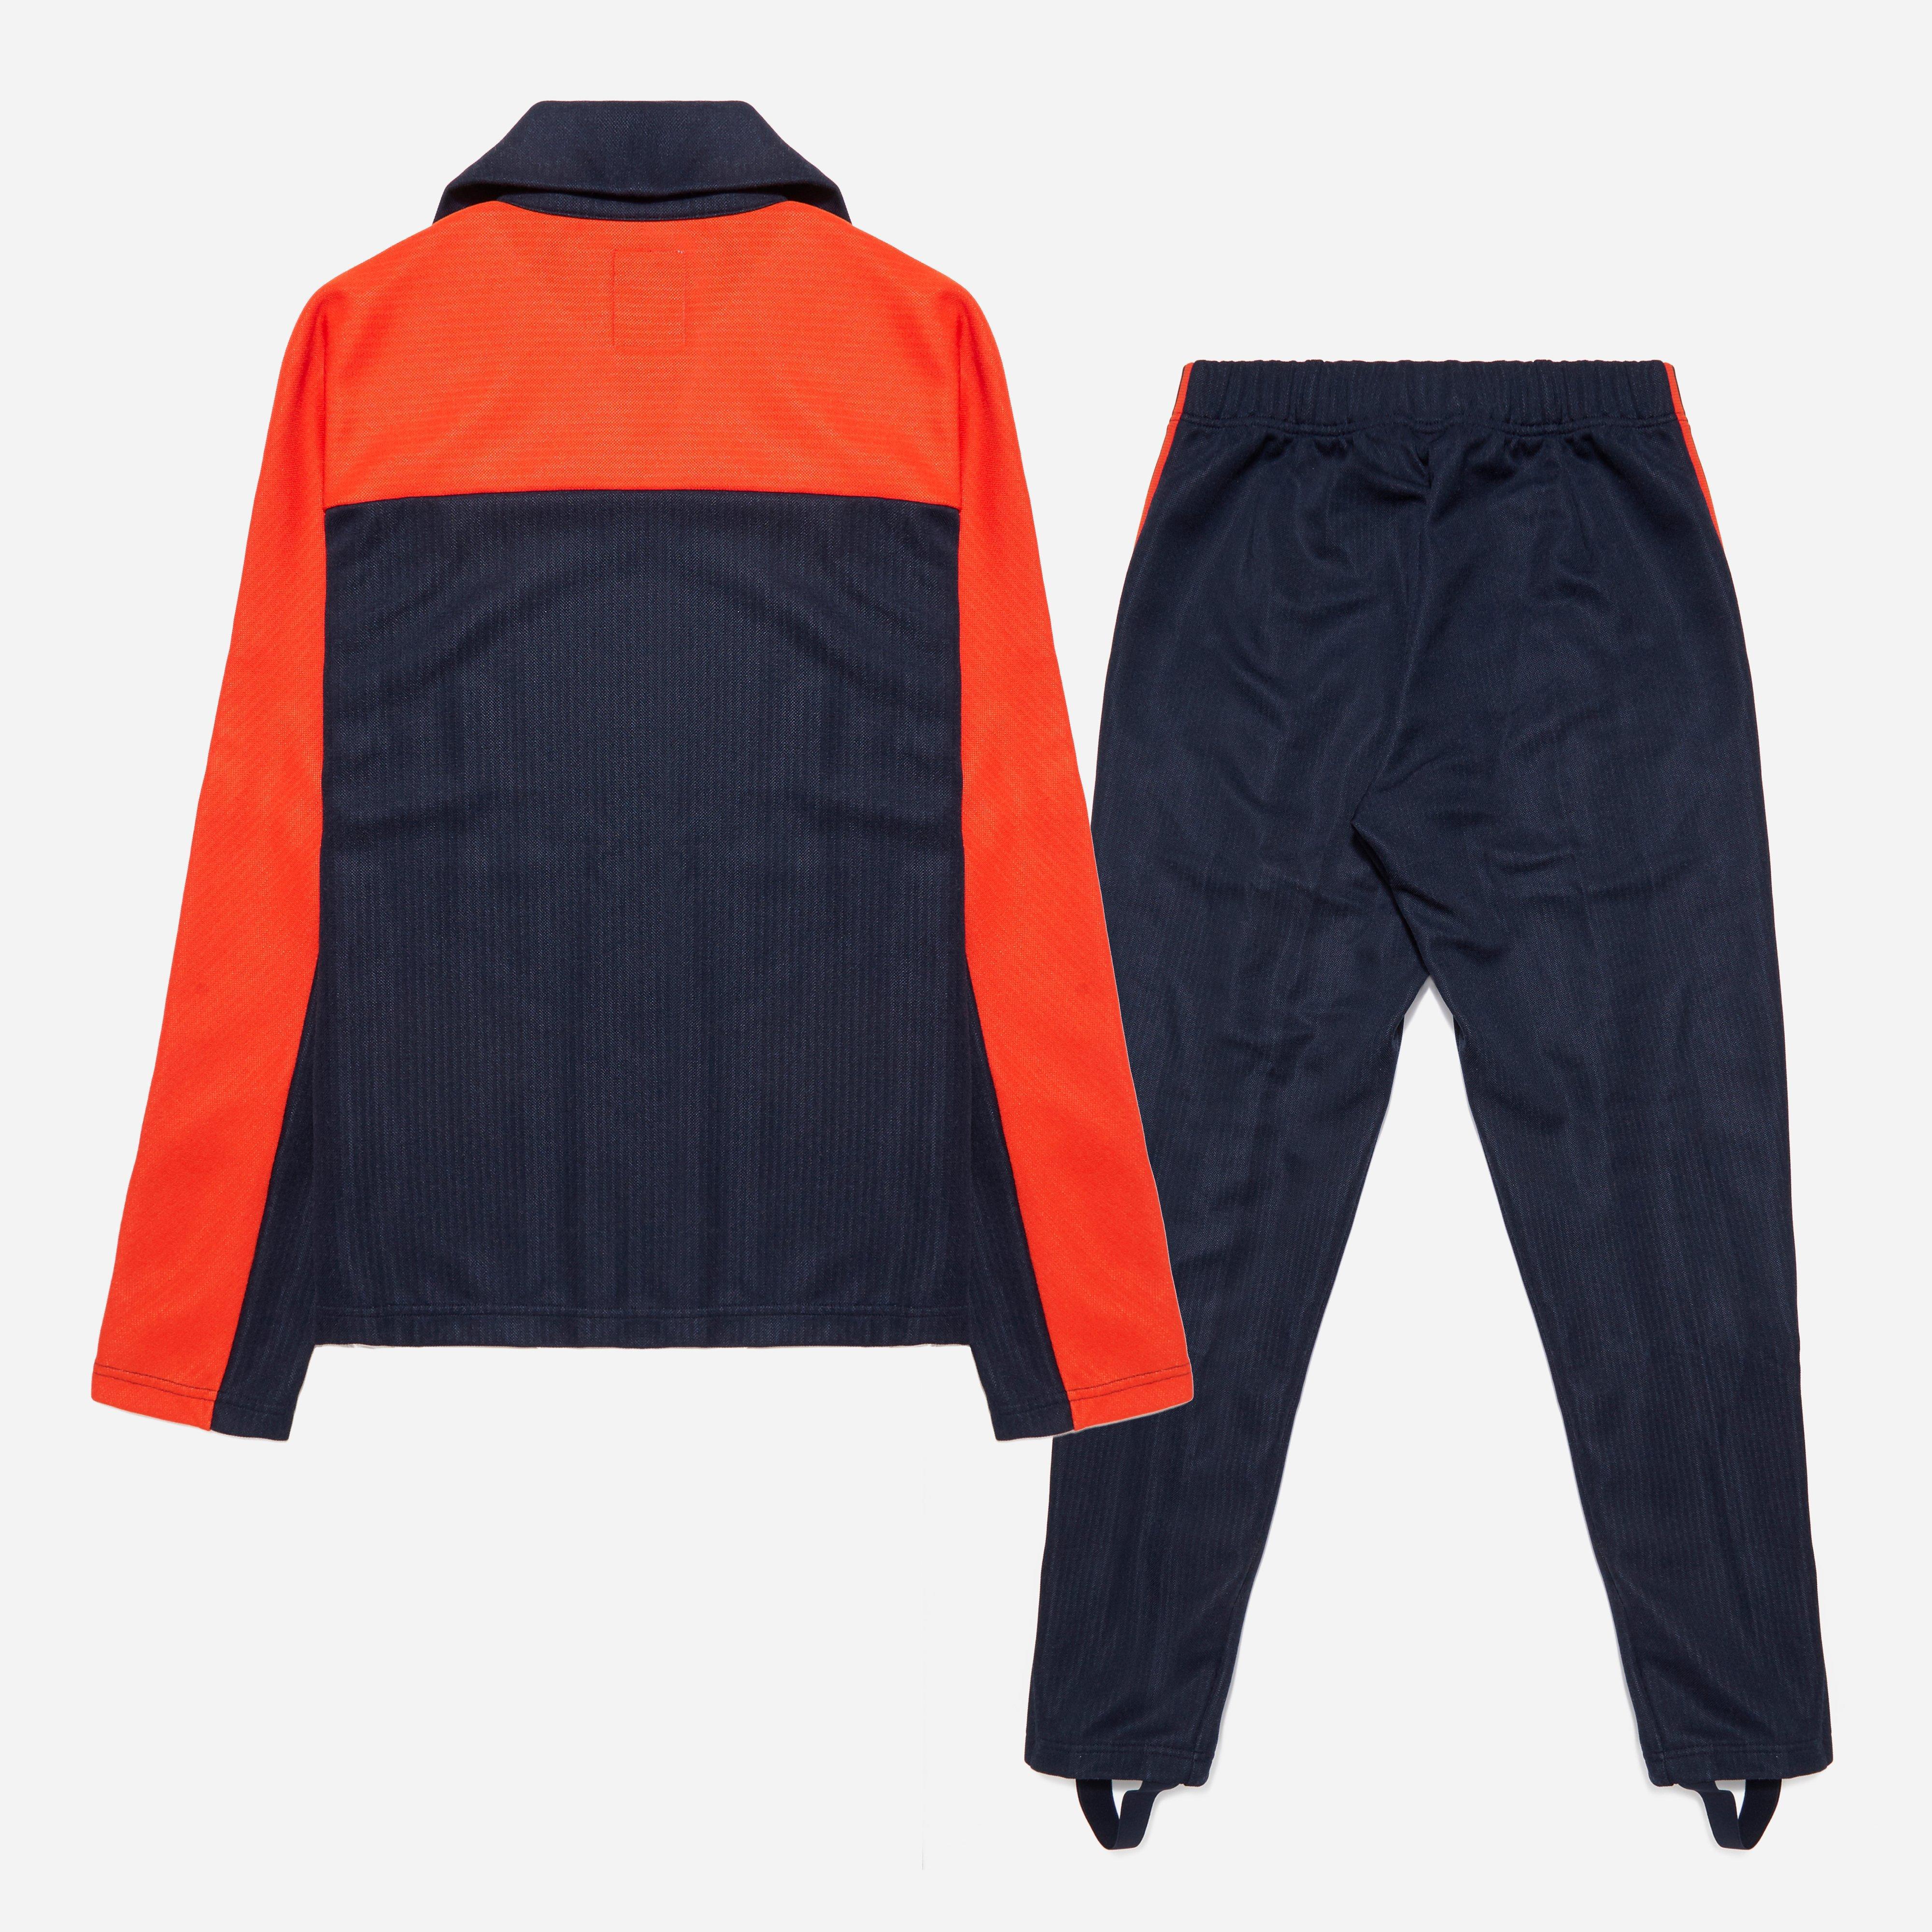 Lyst adidas Originals og chandal made in Japan en azul para los hombres